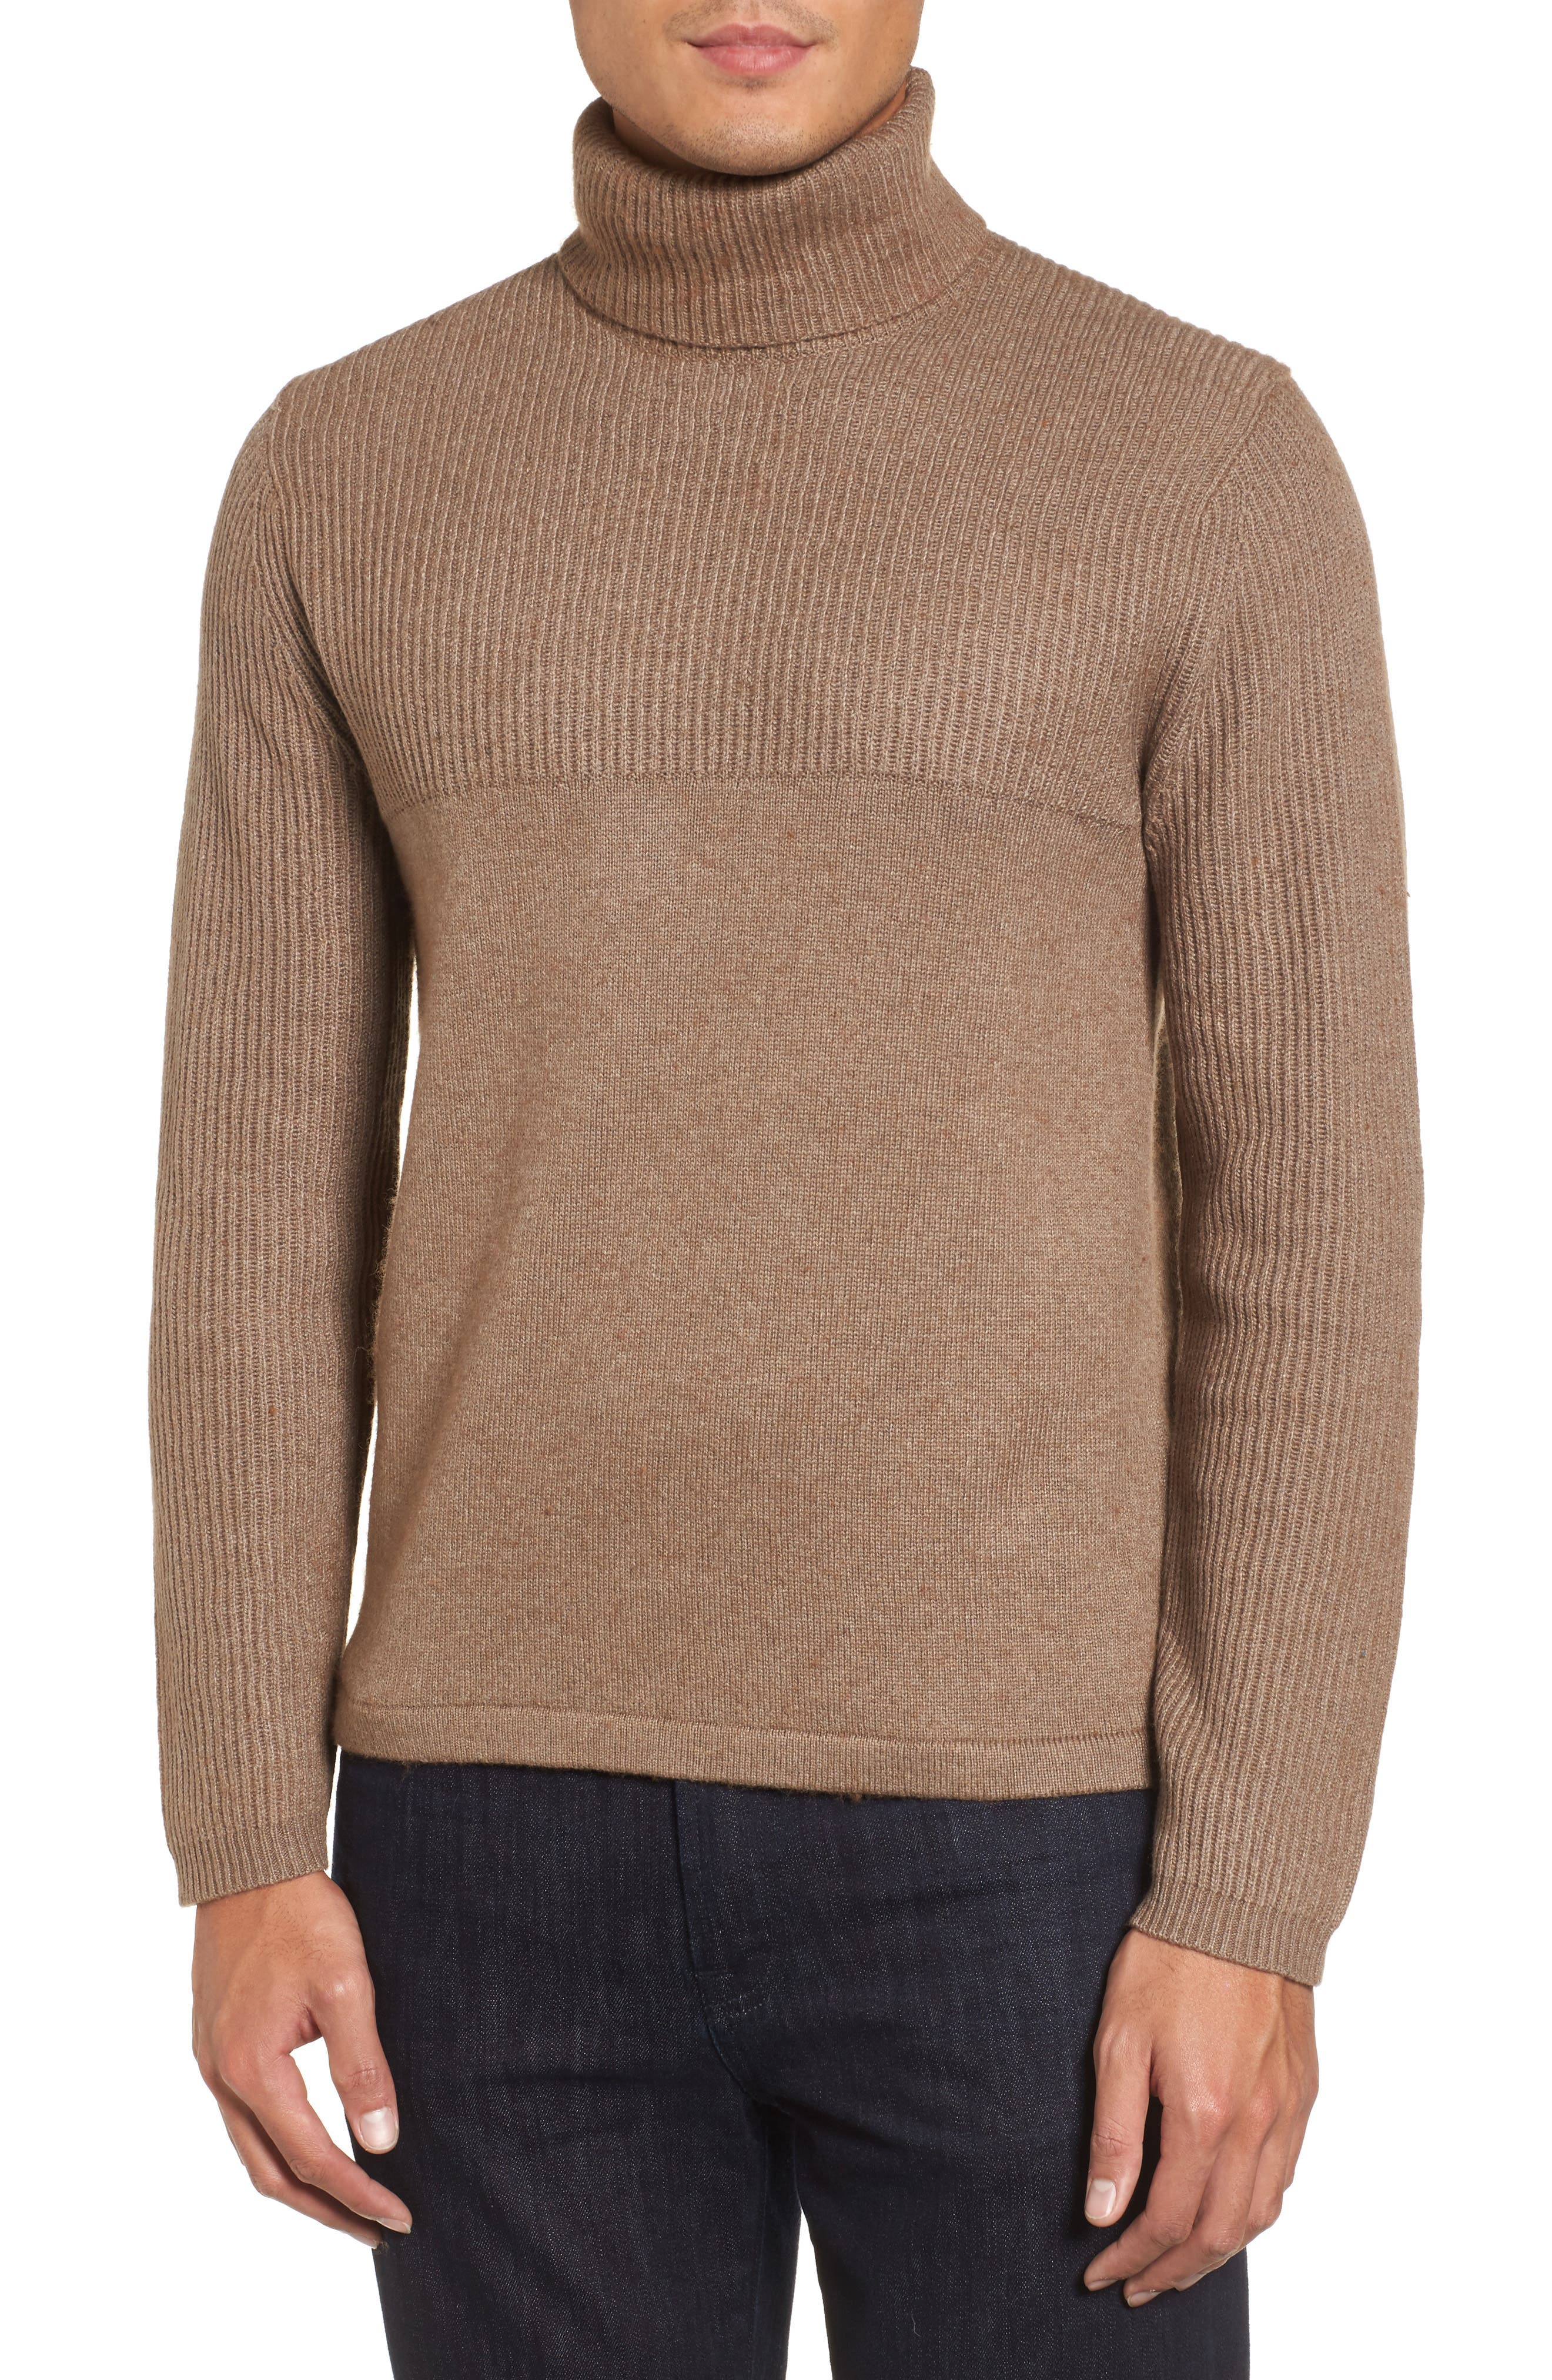 Mix Stitch Turtleneck Sweater,                             Main thumbnail 1, color,                             261